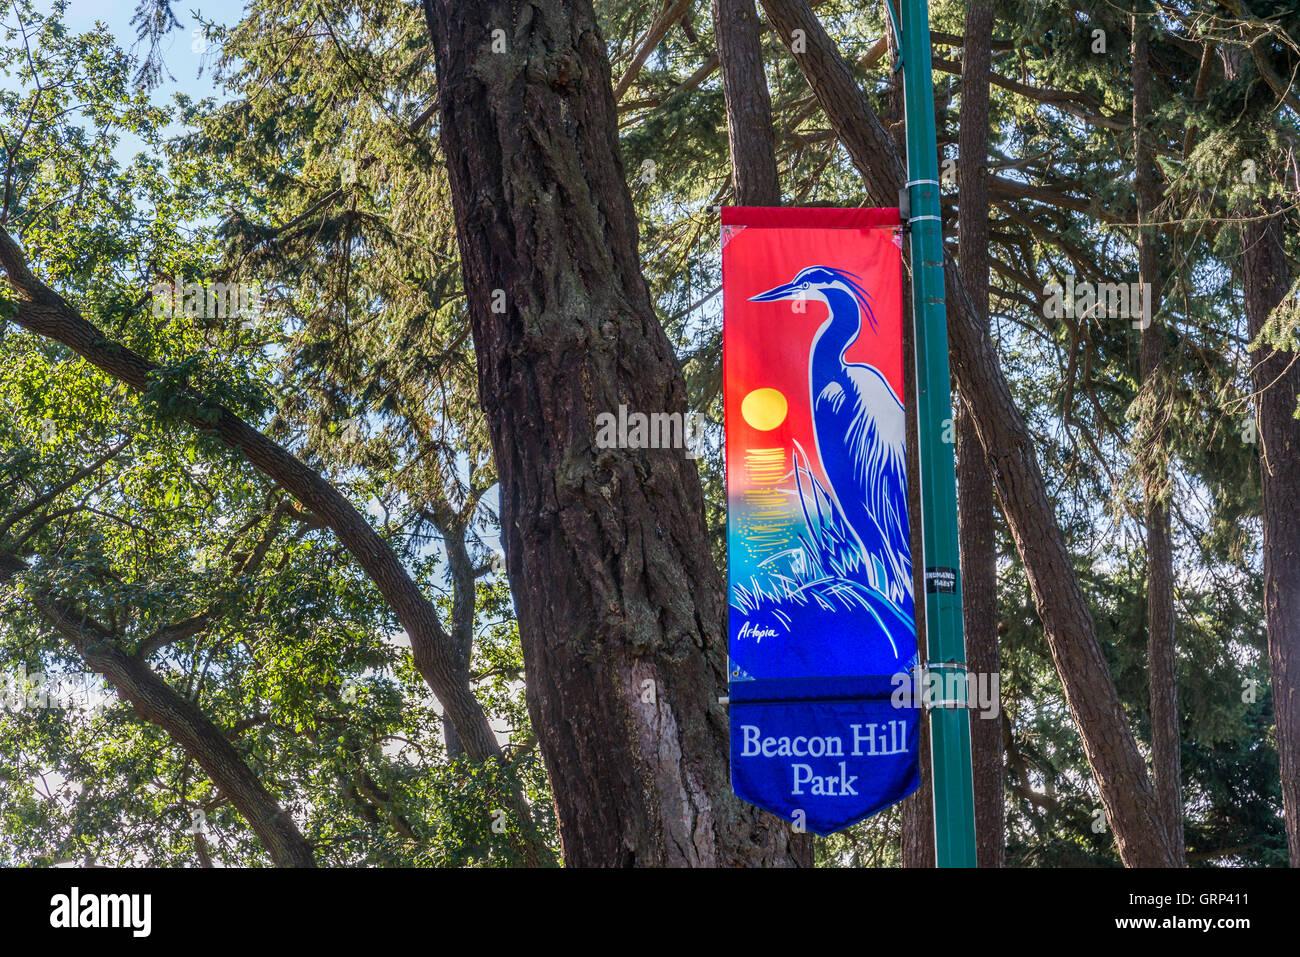 Beacon Hill Park banner, Victoria, British Columbia, Canada - Stock Image